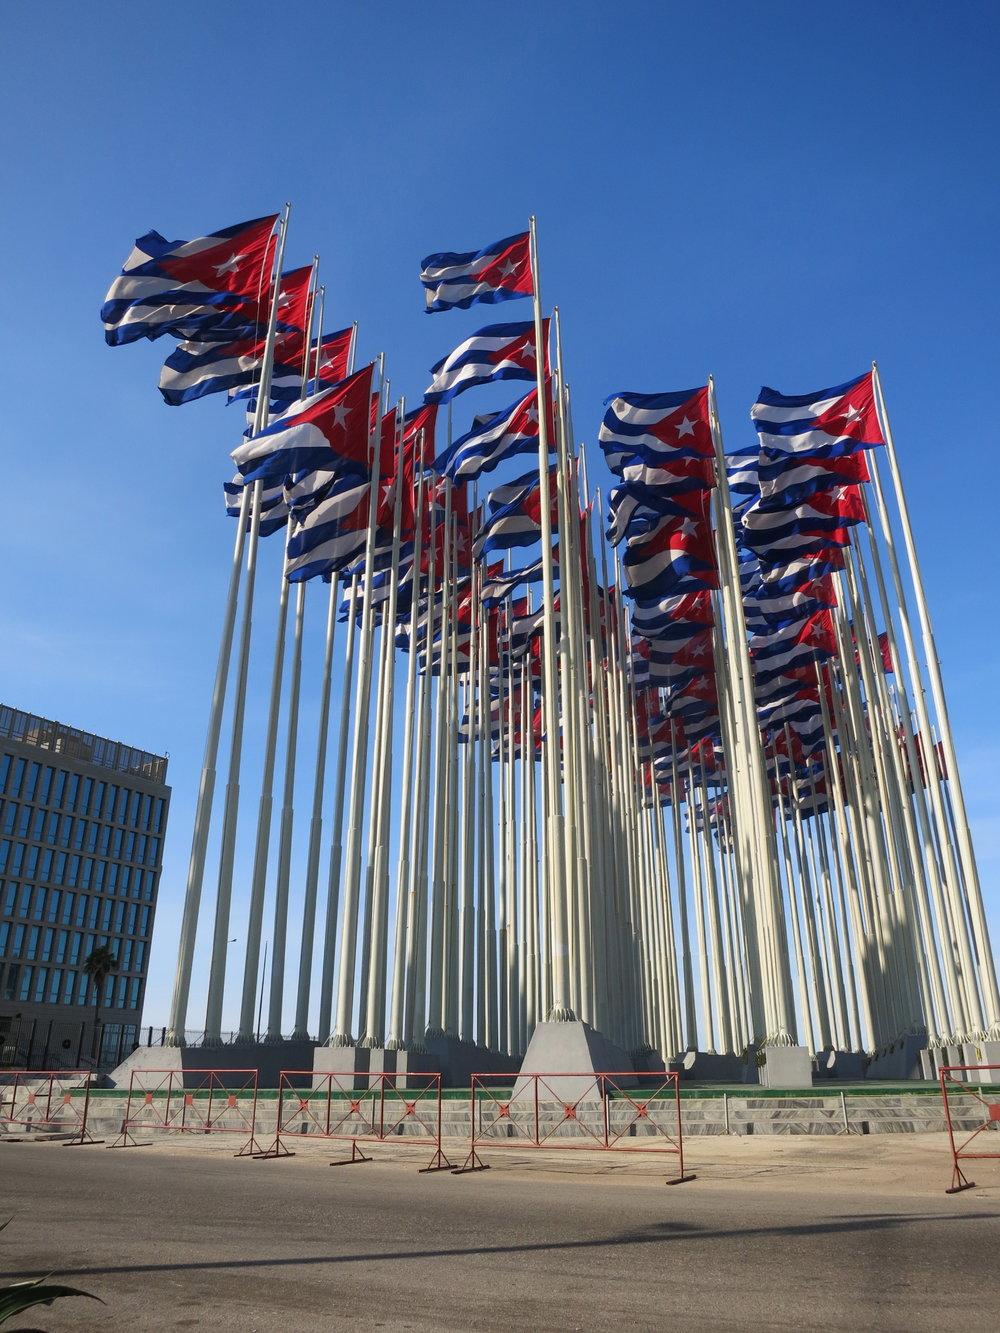 Outside U.S. Interests building, Havana.